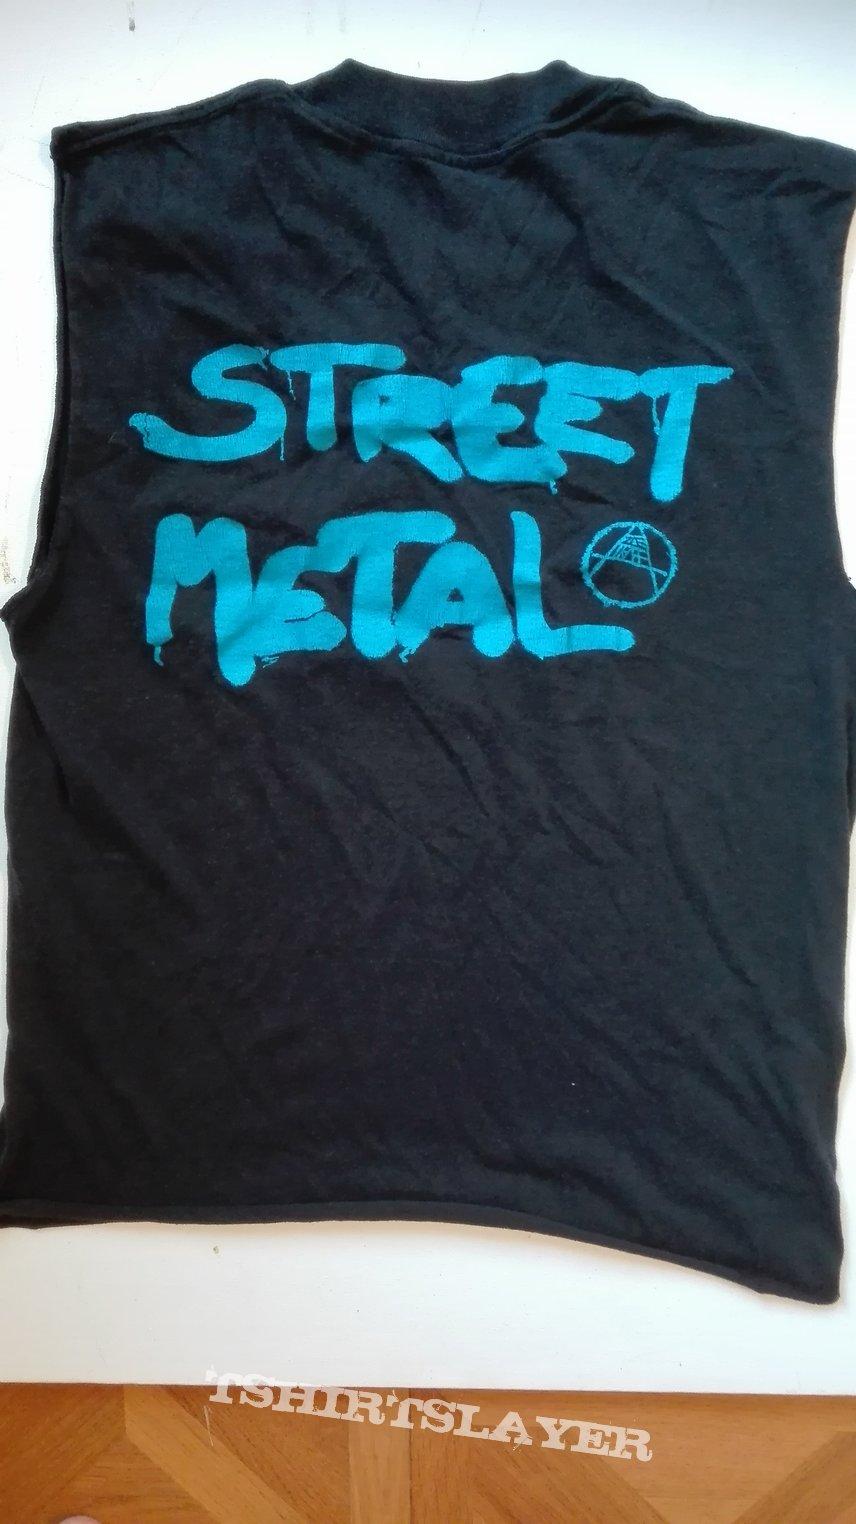 Zoetrope- Street metal shirt